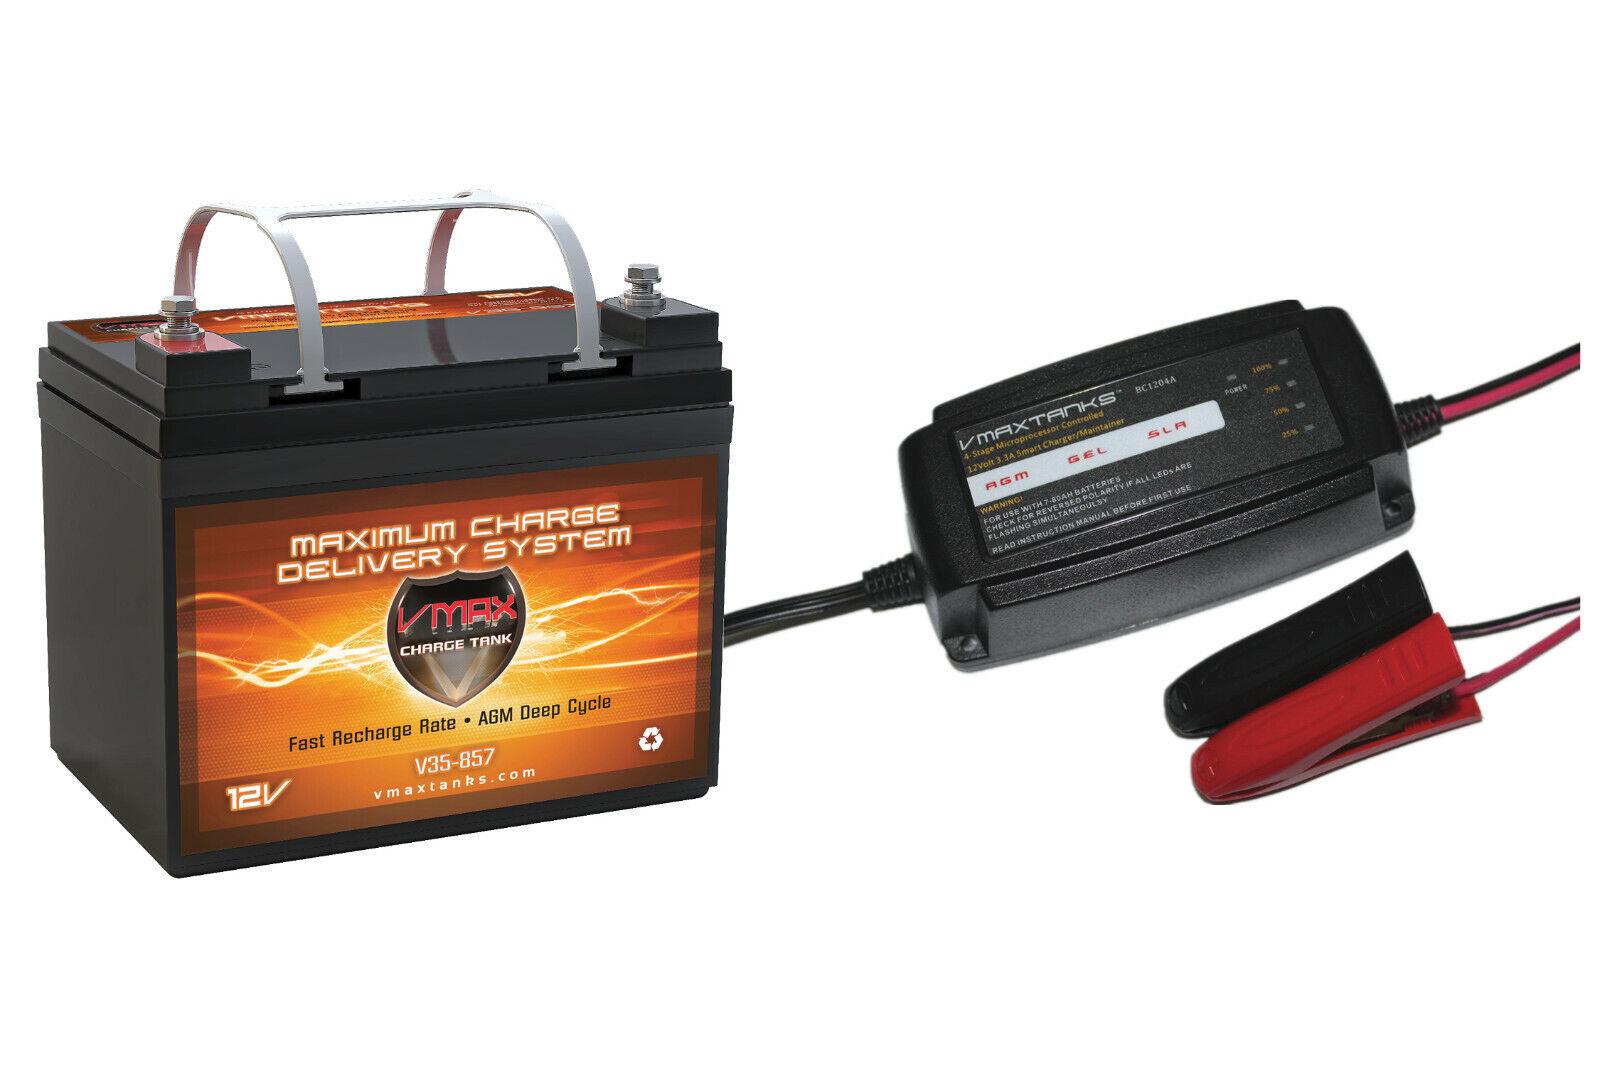 VMAX857 + BC1204: 12V 35Ah AGM SLA battery + Charger for Pow